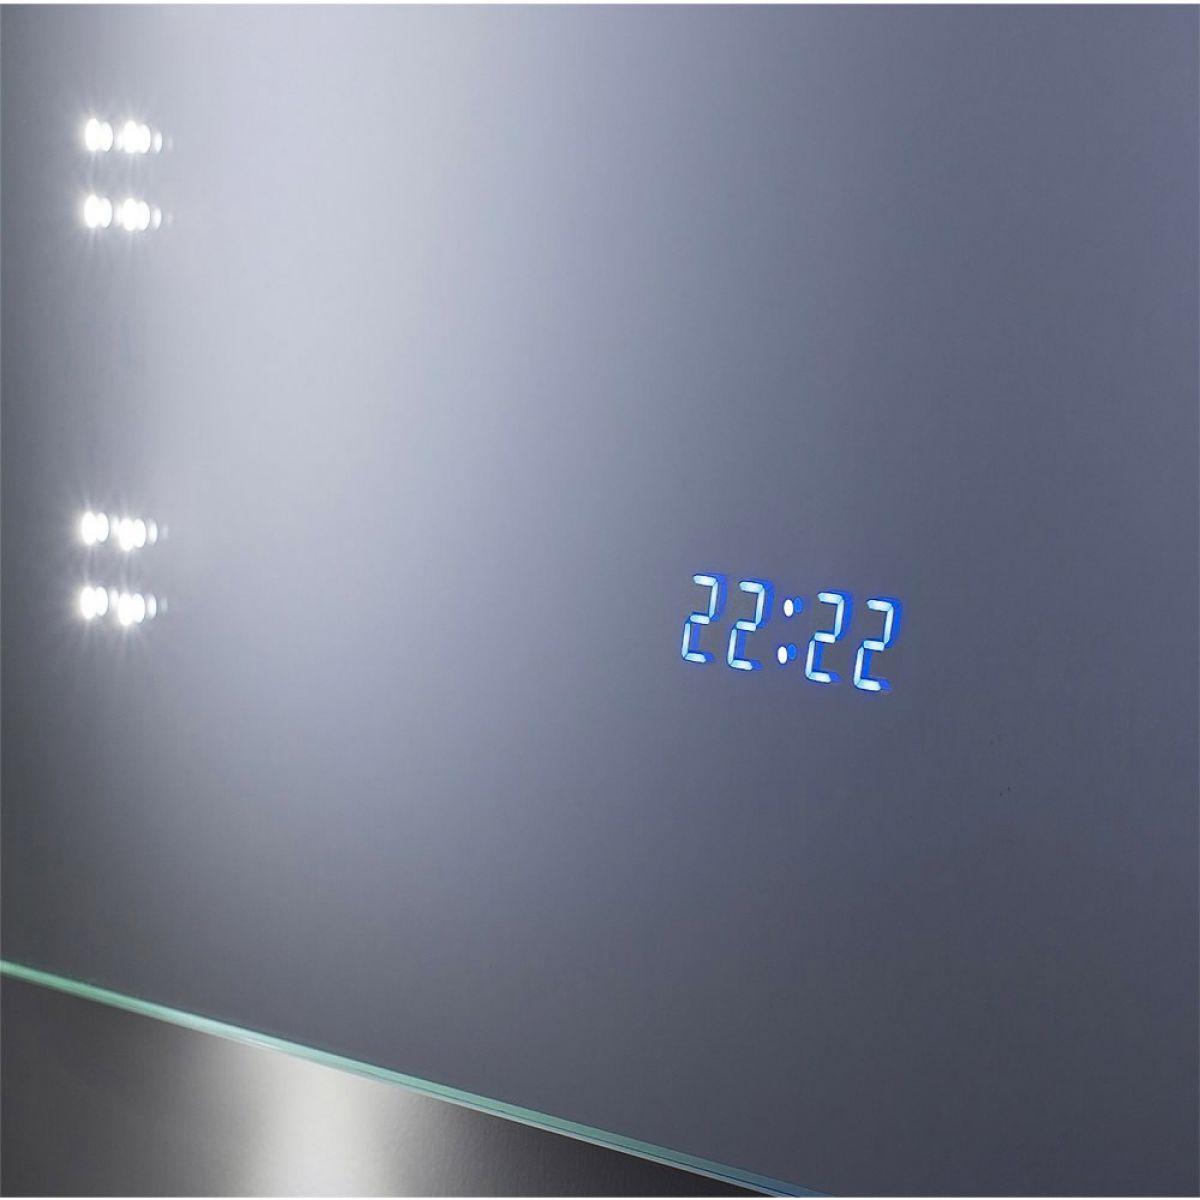 bauhaus rio led mirror with clock uk bathrooms. Black Bedroom Furniture Sets. Home Design Ideas